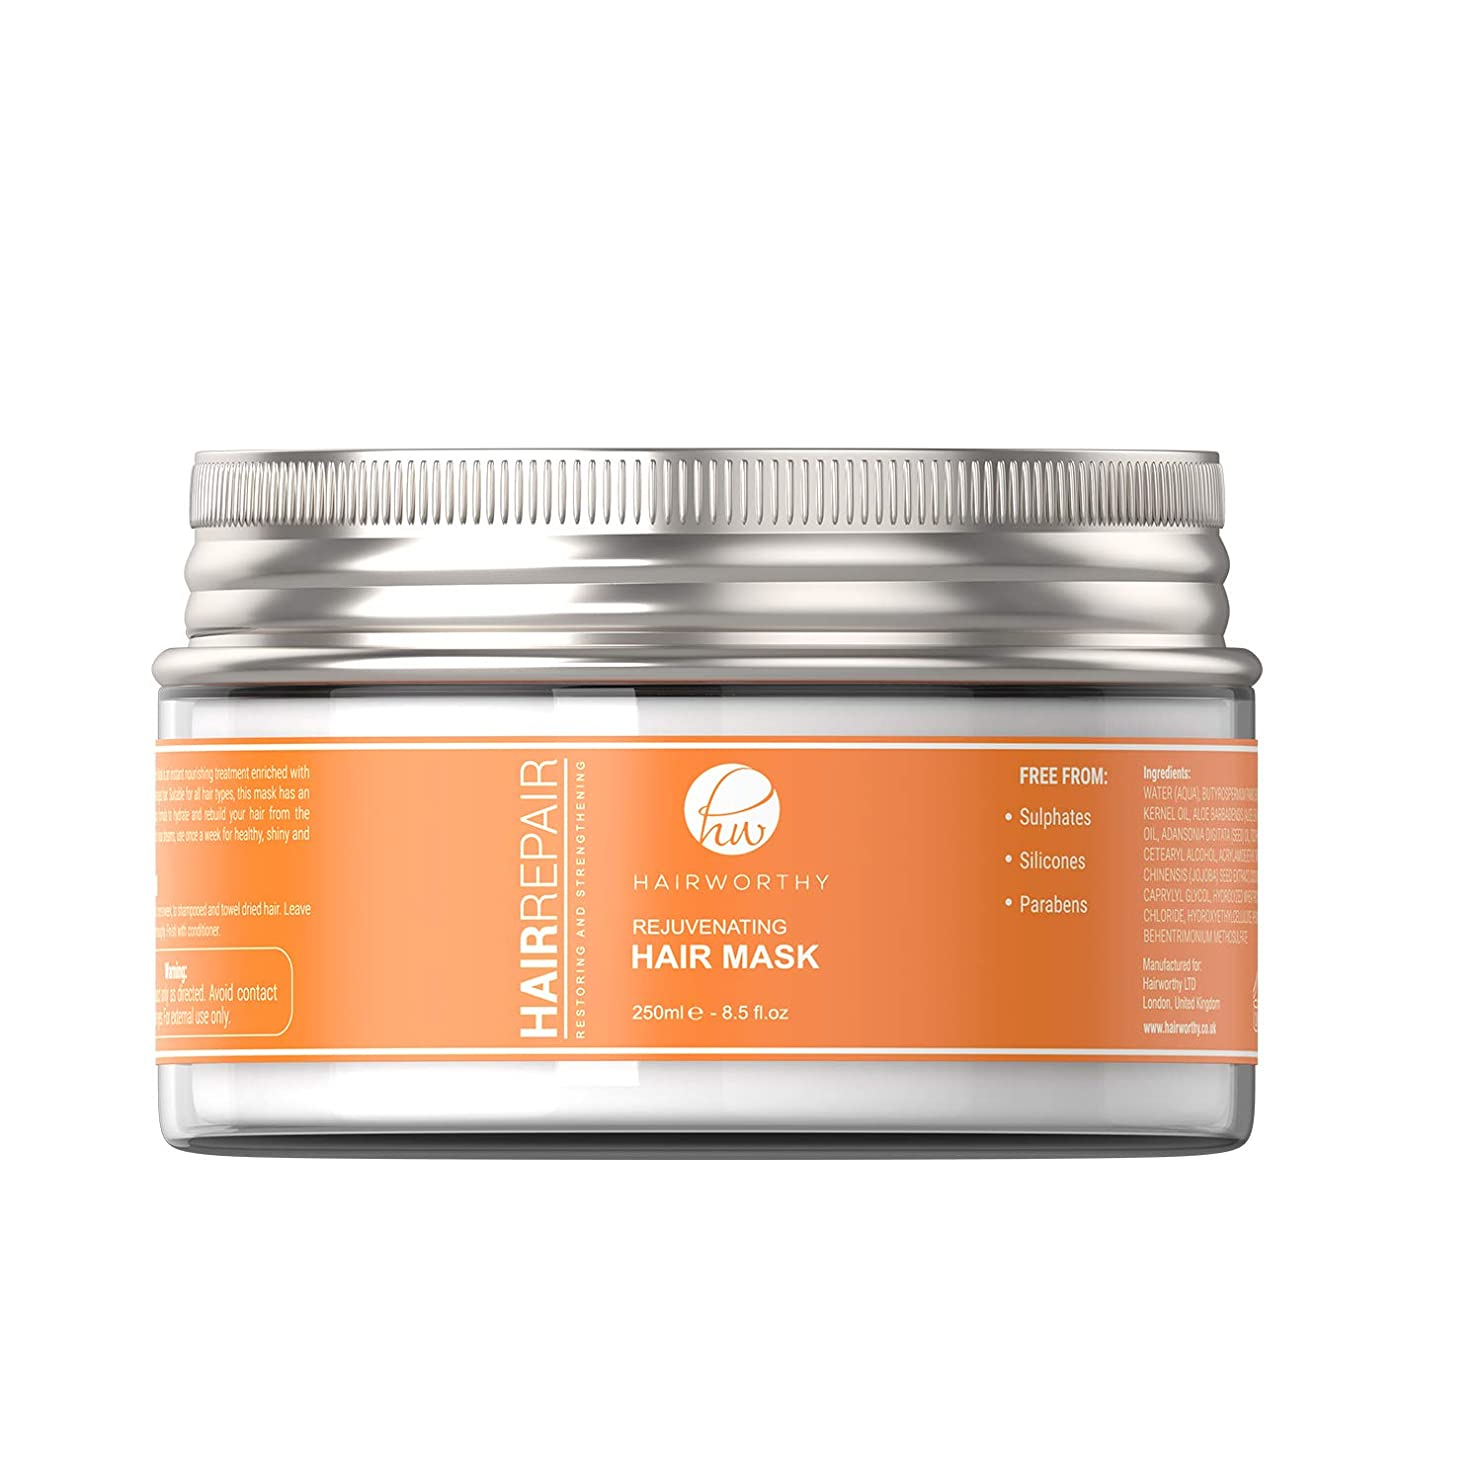 Hairworthy Hairrepair Rejuvenating Hair Mask - 若返りヘアマスク、インスタント栄養治療、柔らかく、光沢のある健康的な髪のための集中 的な深い活性化式。